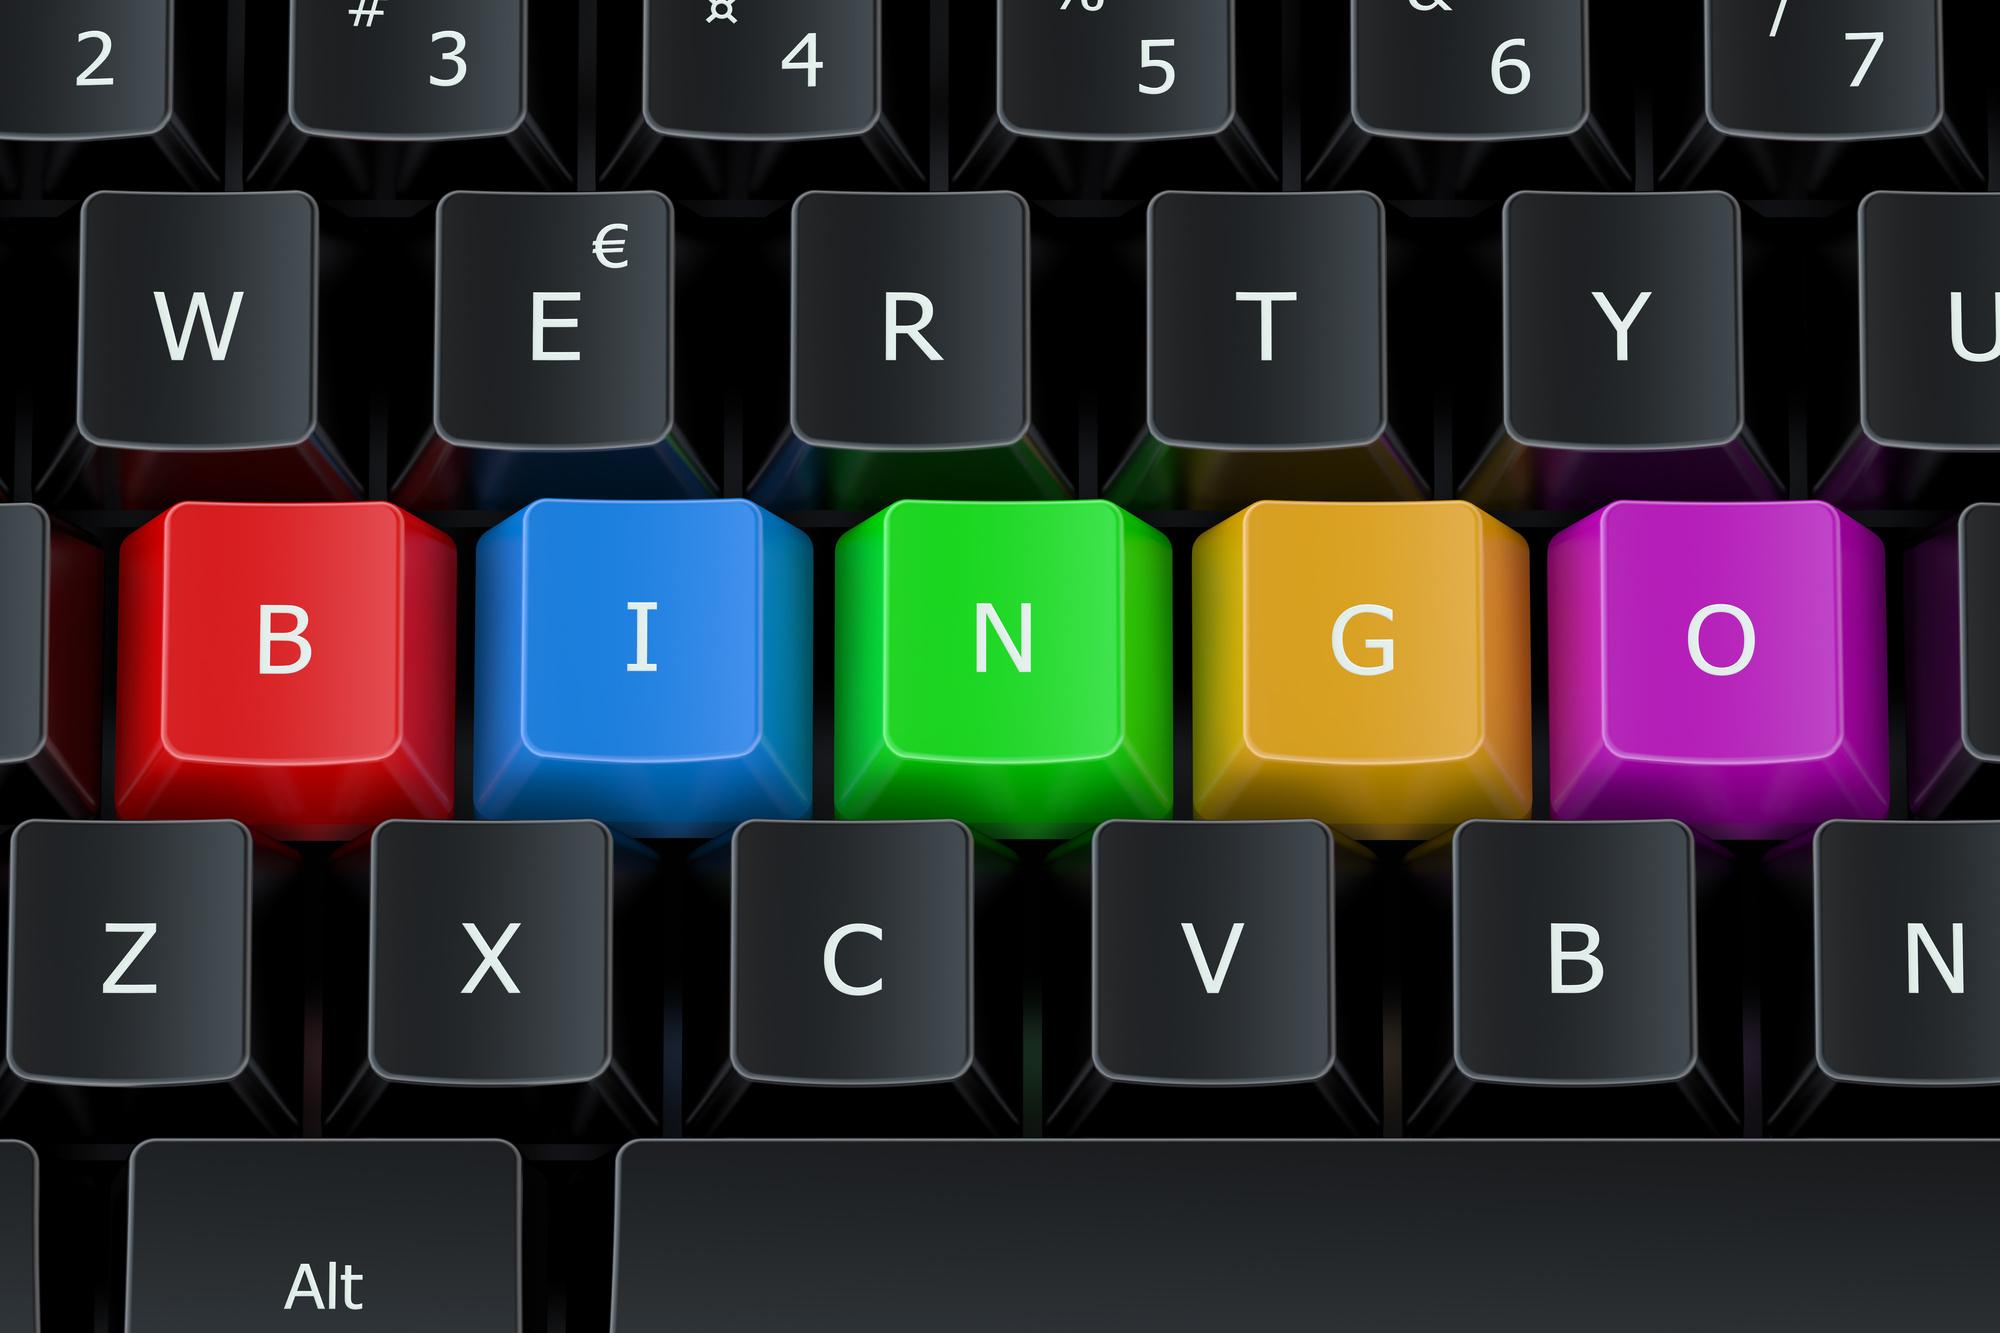 bingo on a computer